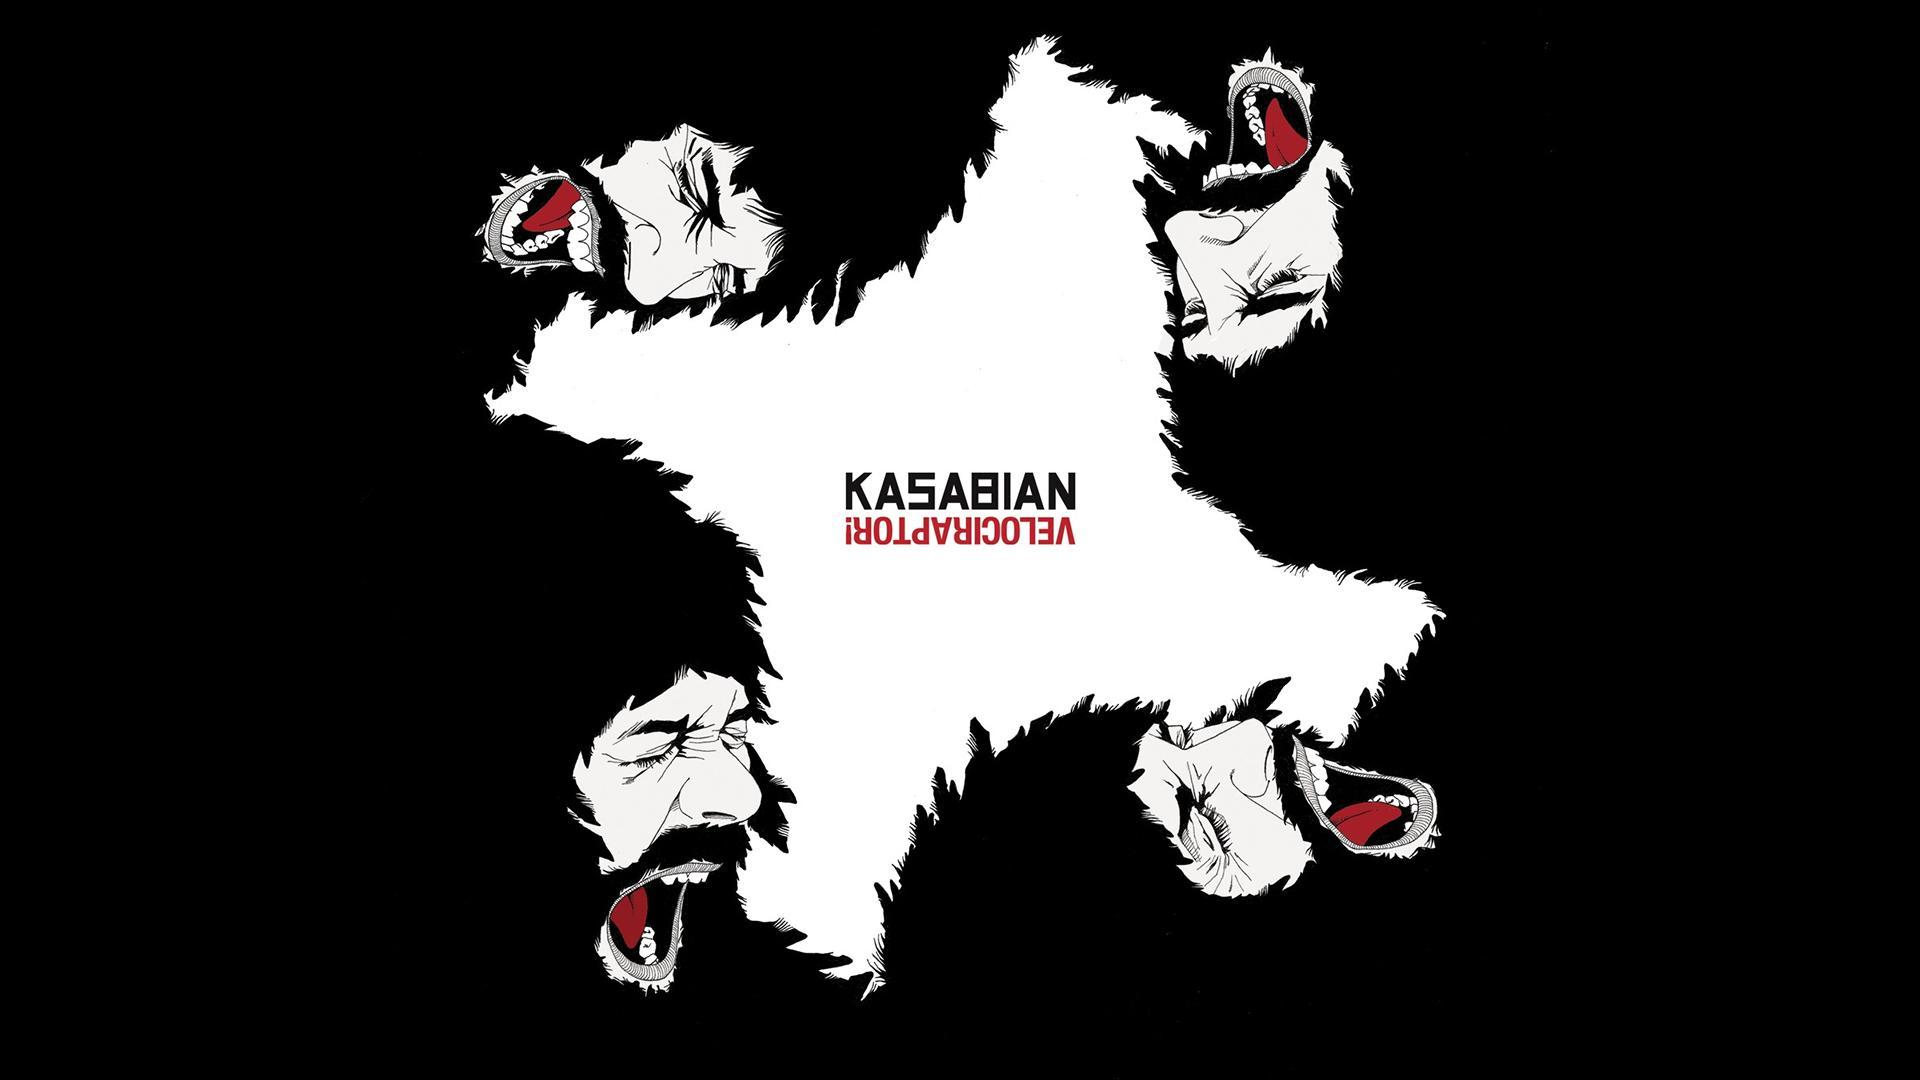 Psychedelic rock Rock music Kasabian Indie rock HD Wallpapers